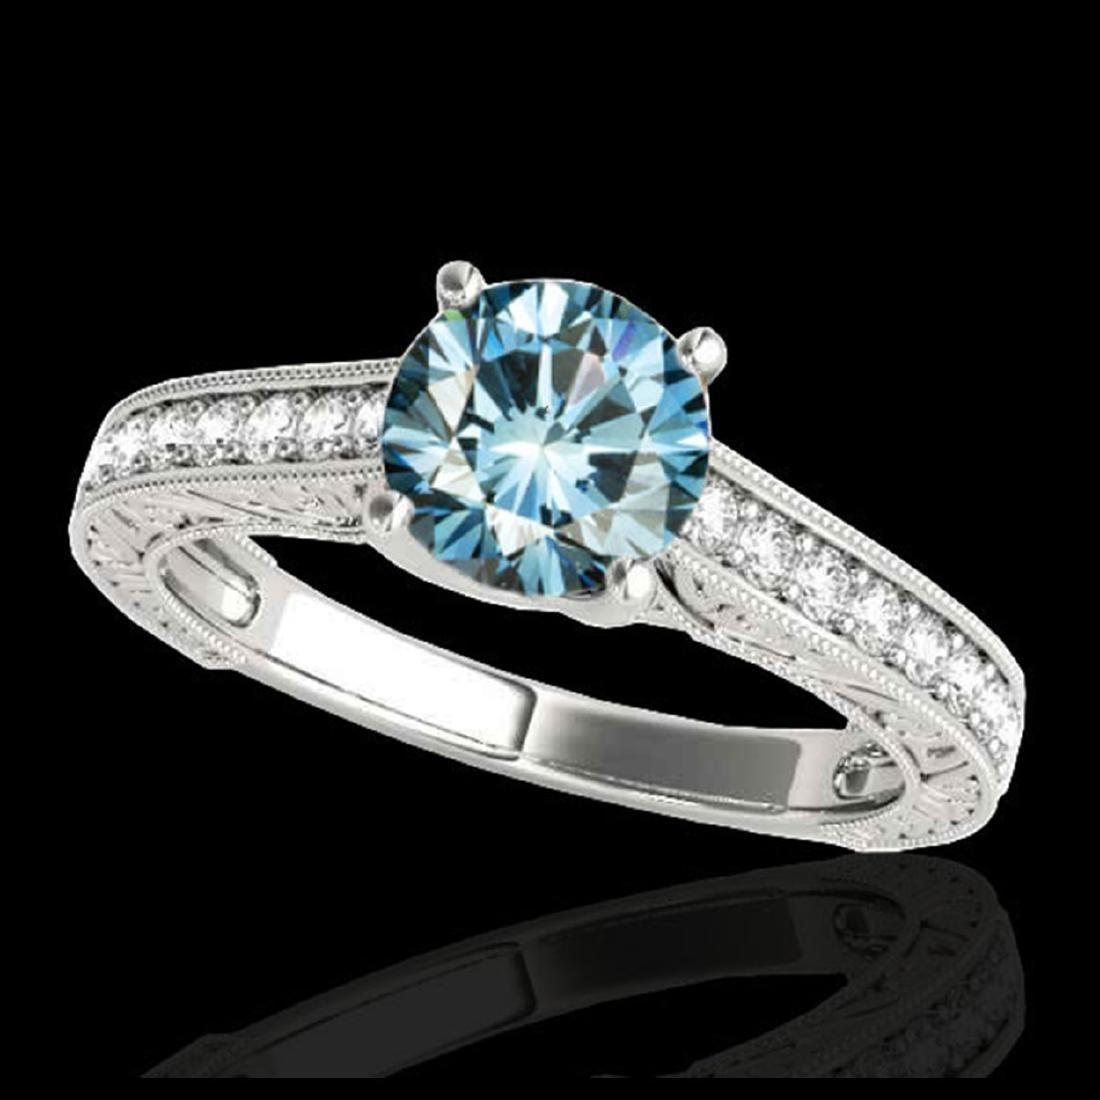 1.82 ctw SI Fancy Blue Diamond Solitaire Ring 10K White